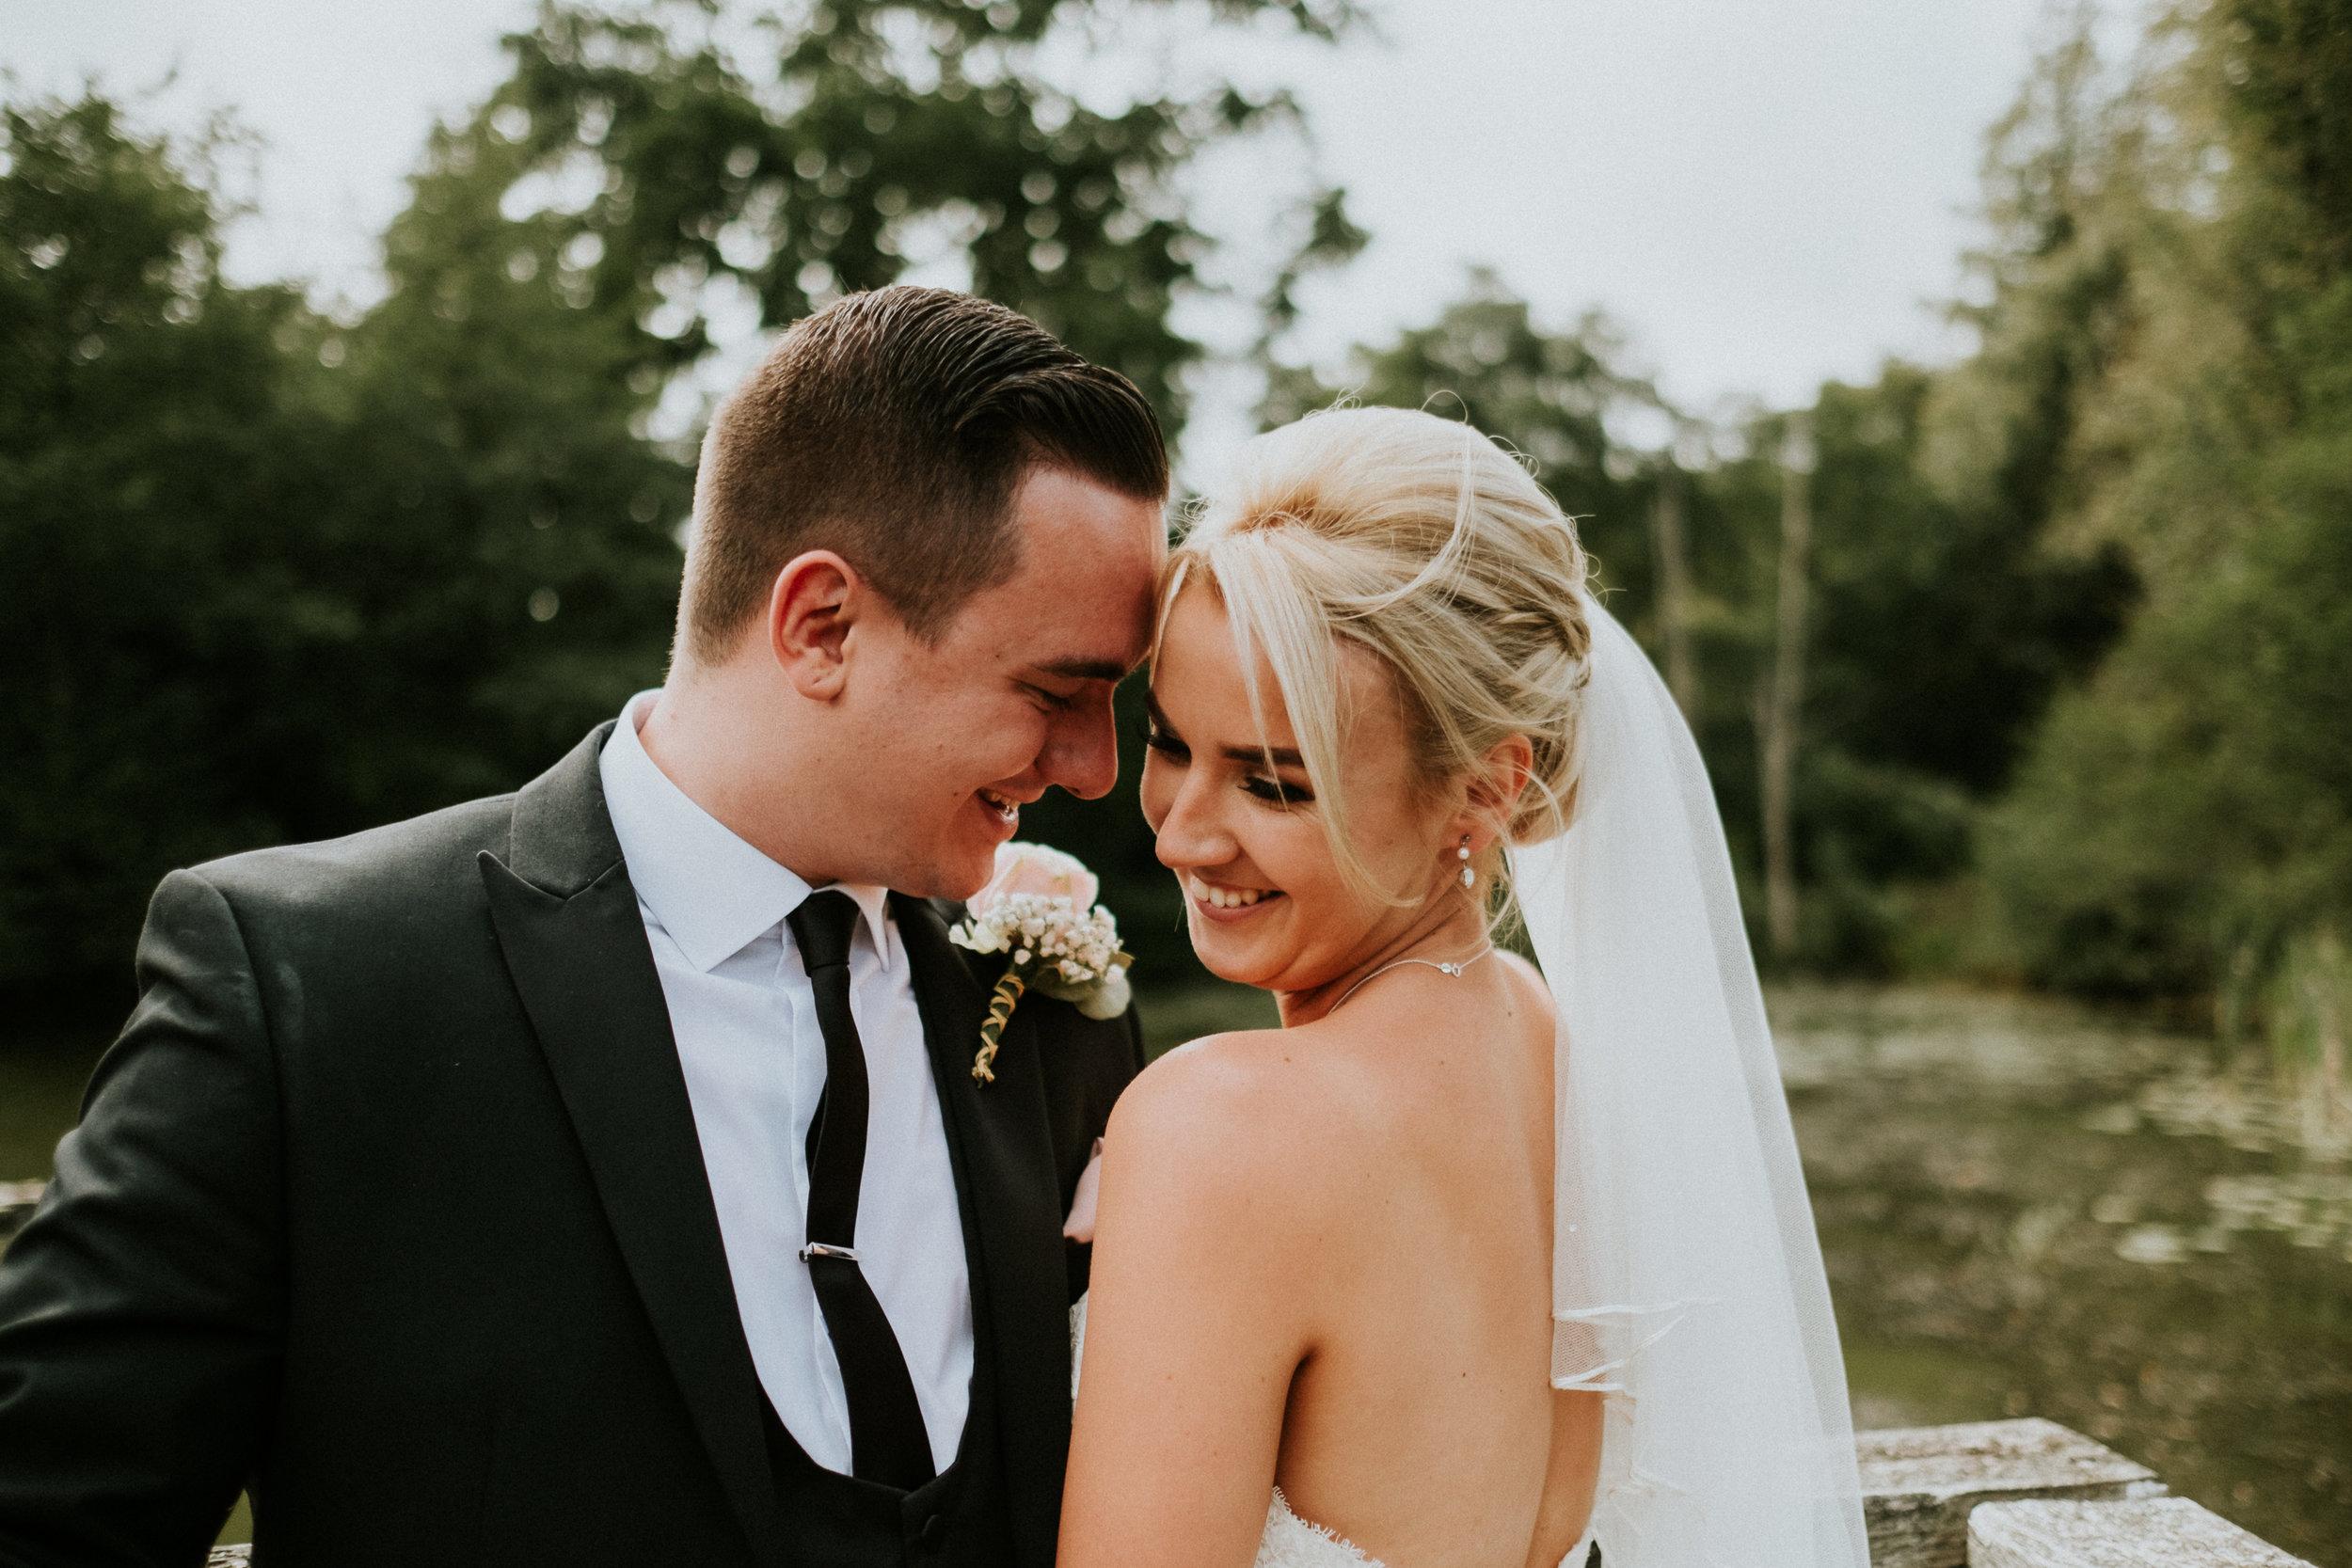 82 Kent wedding photographer creative fun joanna nicole photography 1.jpg